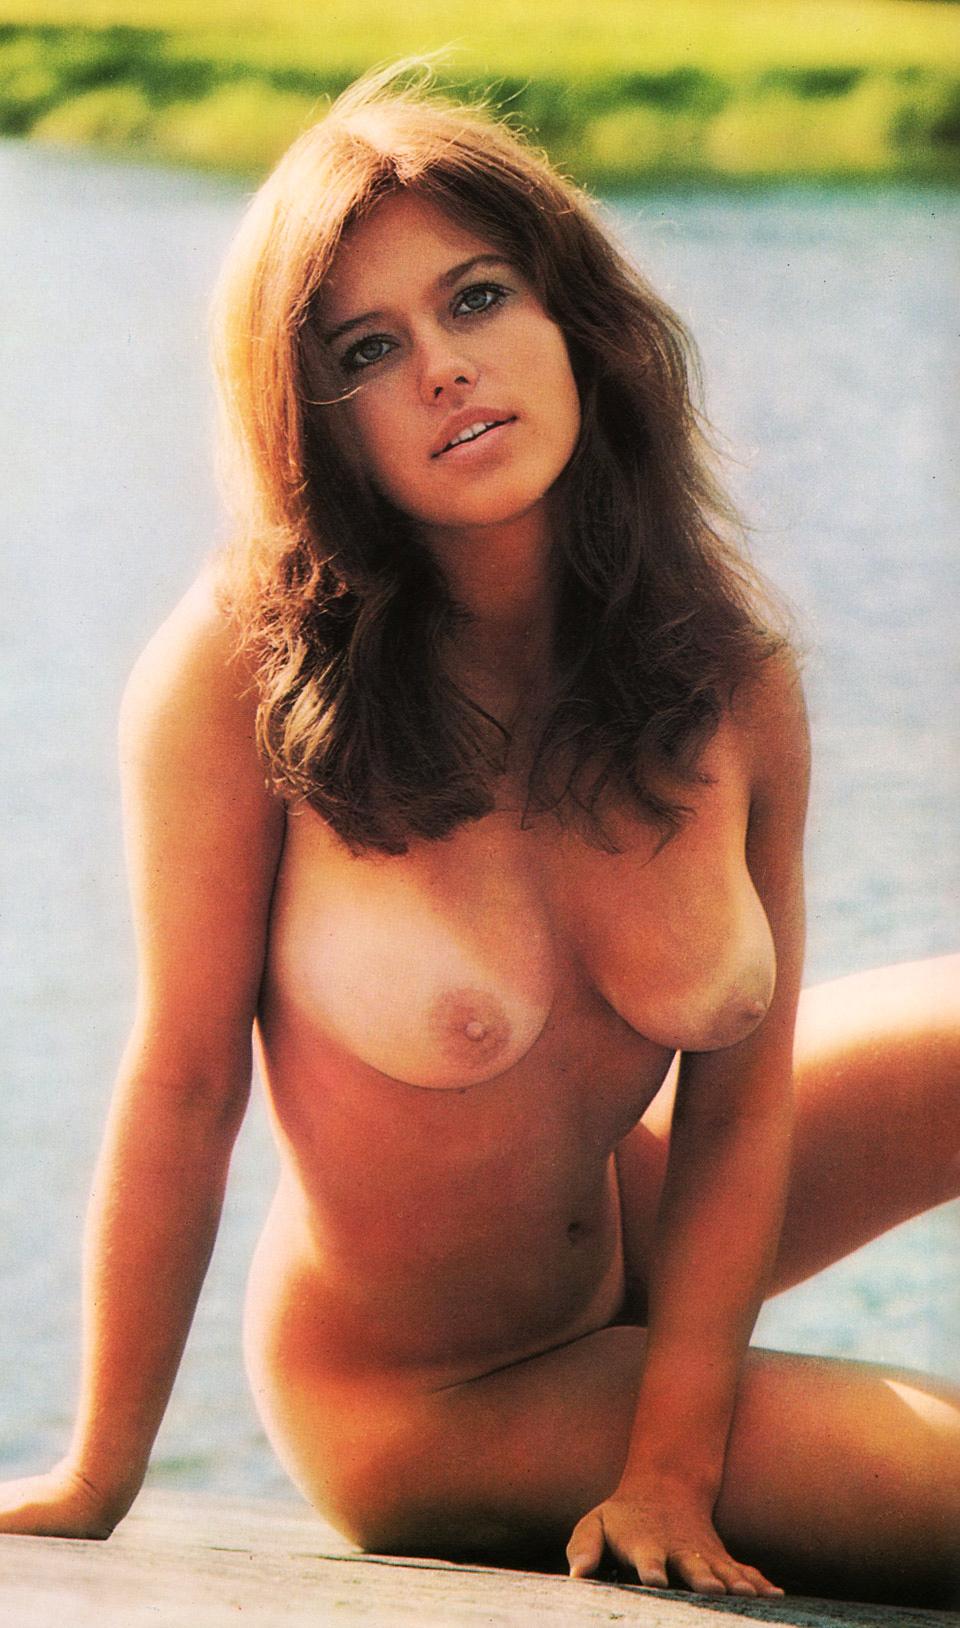 marie-ekorre-knave-magazine-1971